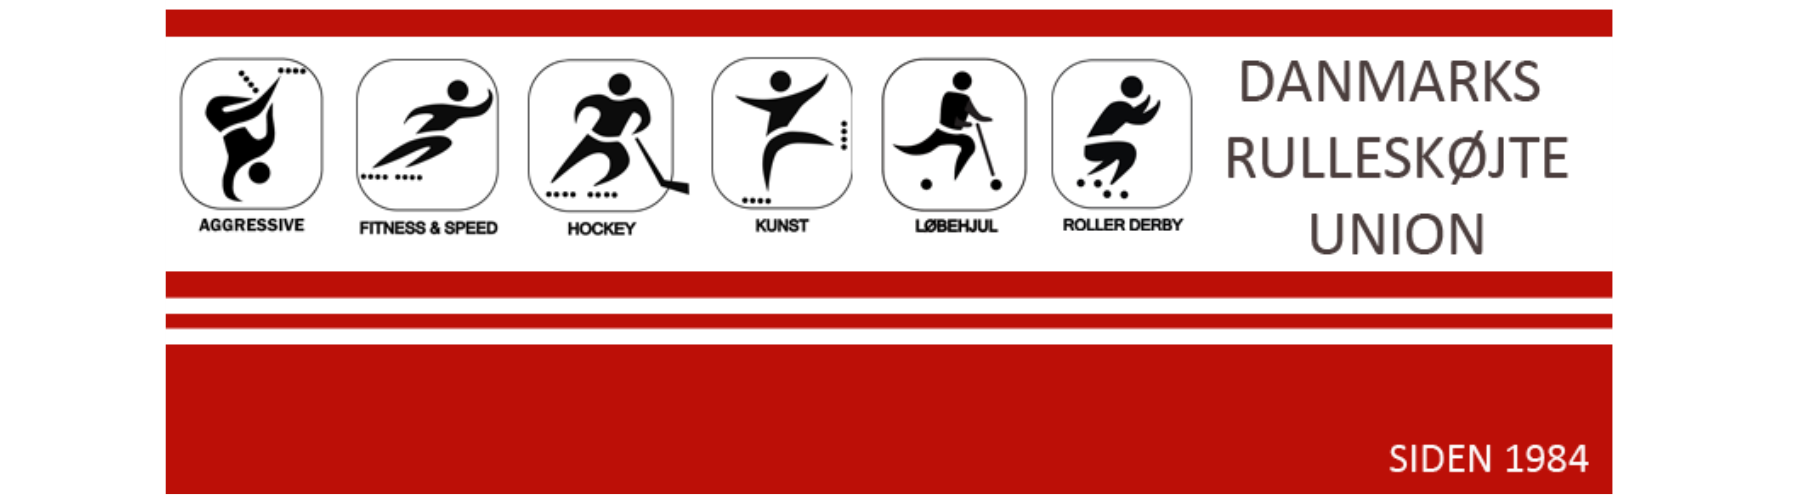 Danmarks Rulleskøjte Unions cover image